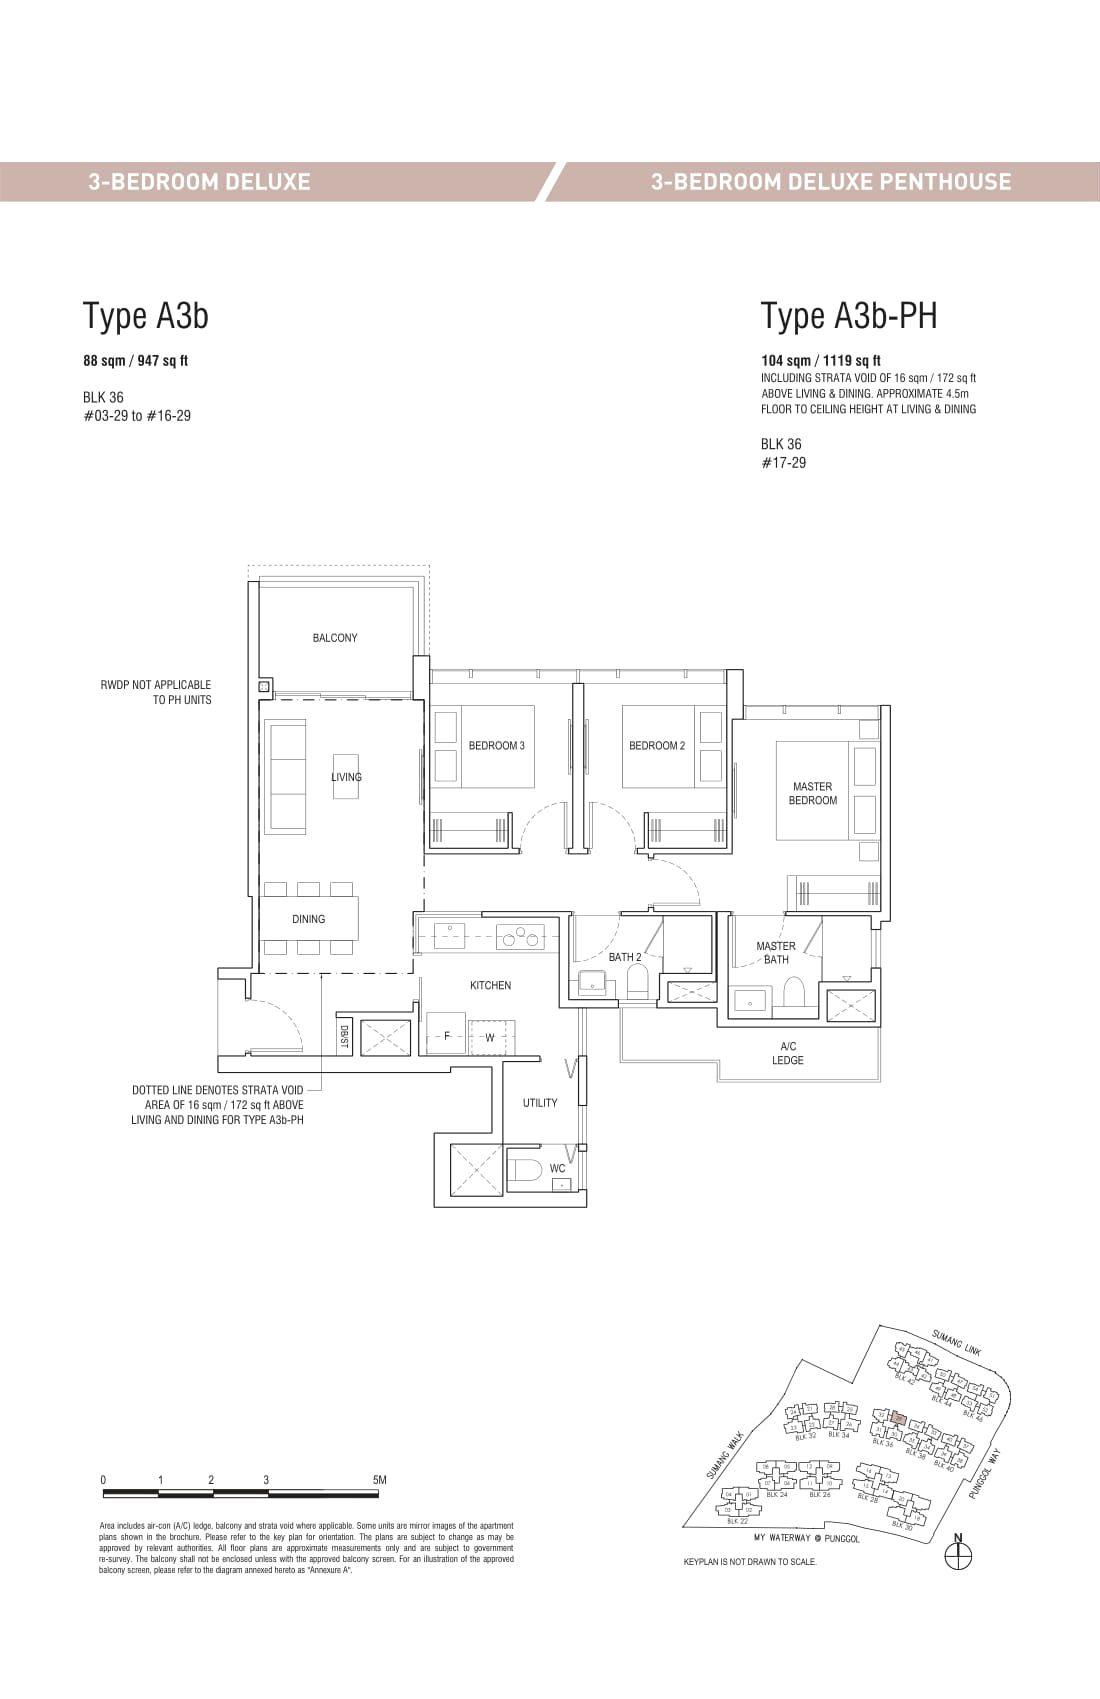 Piermont Grand EC's three-bedroom deluxe and three-bedroom deluxe penthouse types